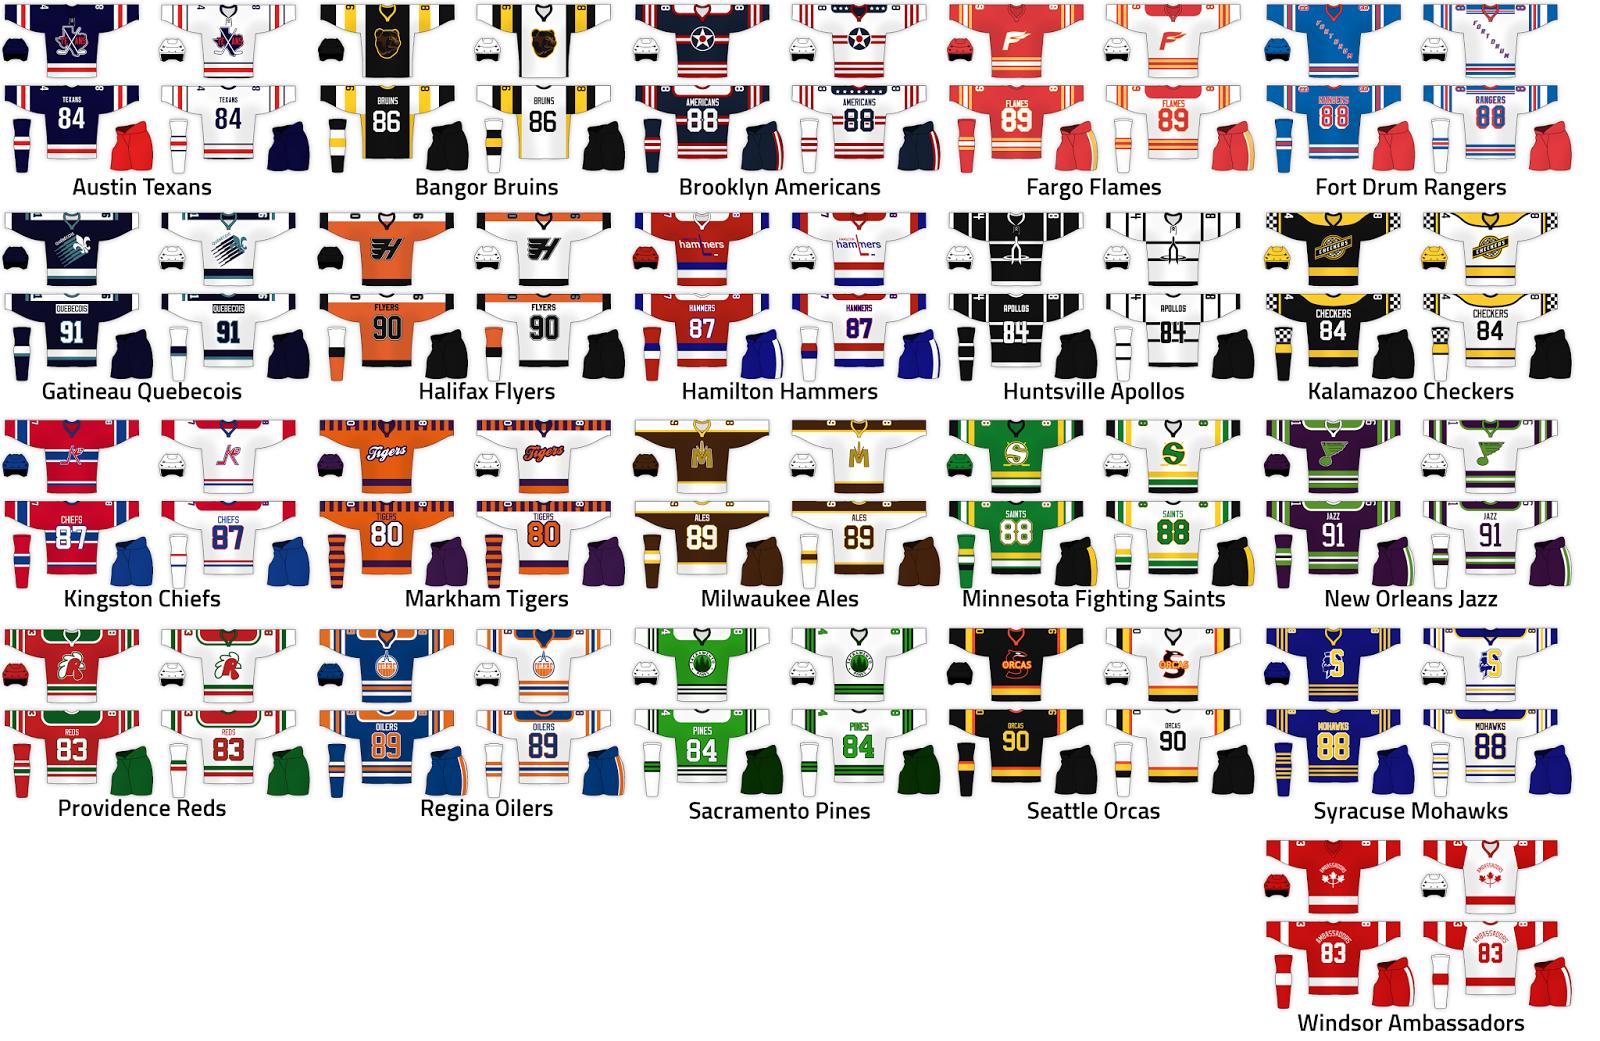 Pan-American Hockey League fictional league I found online ...